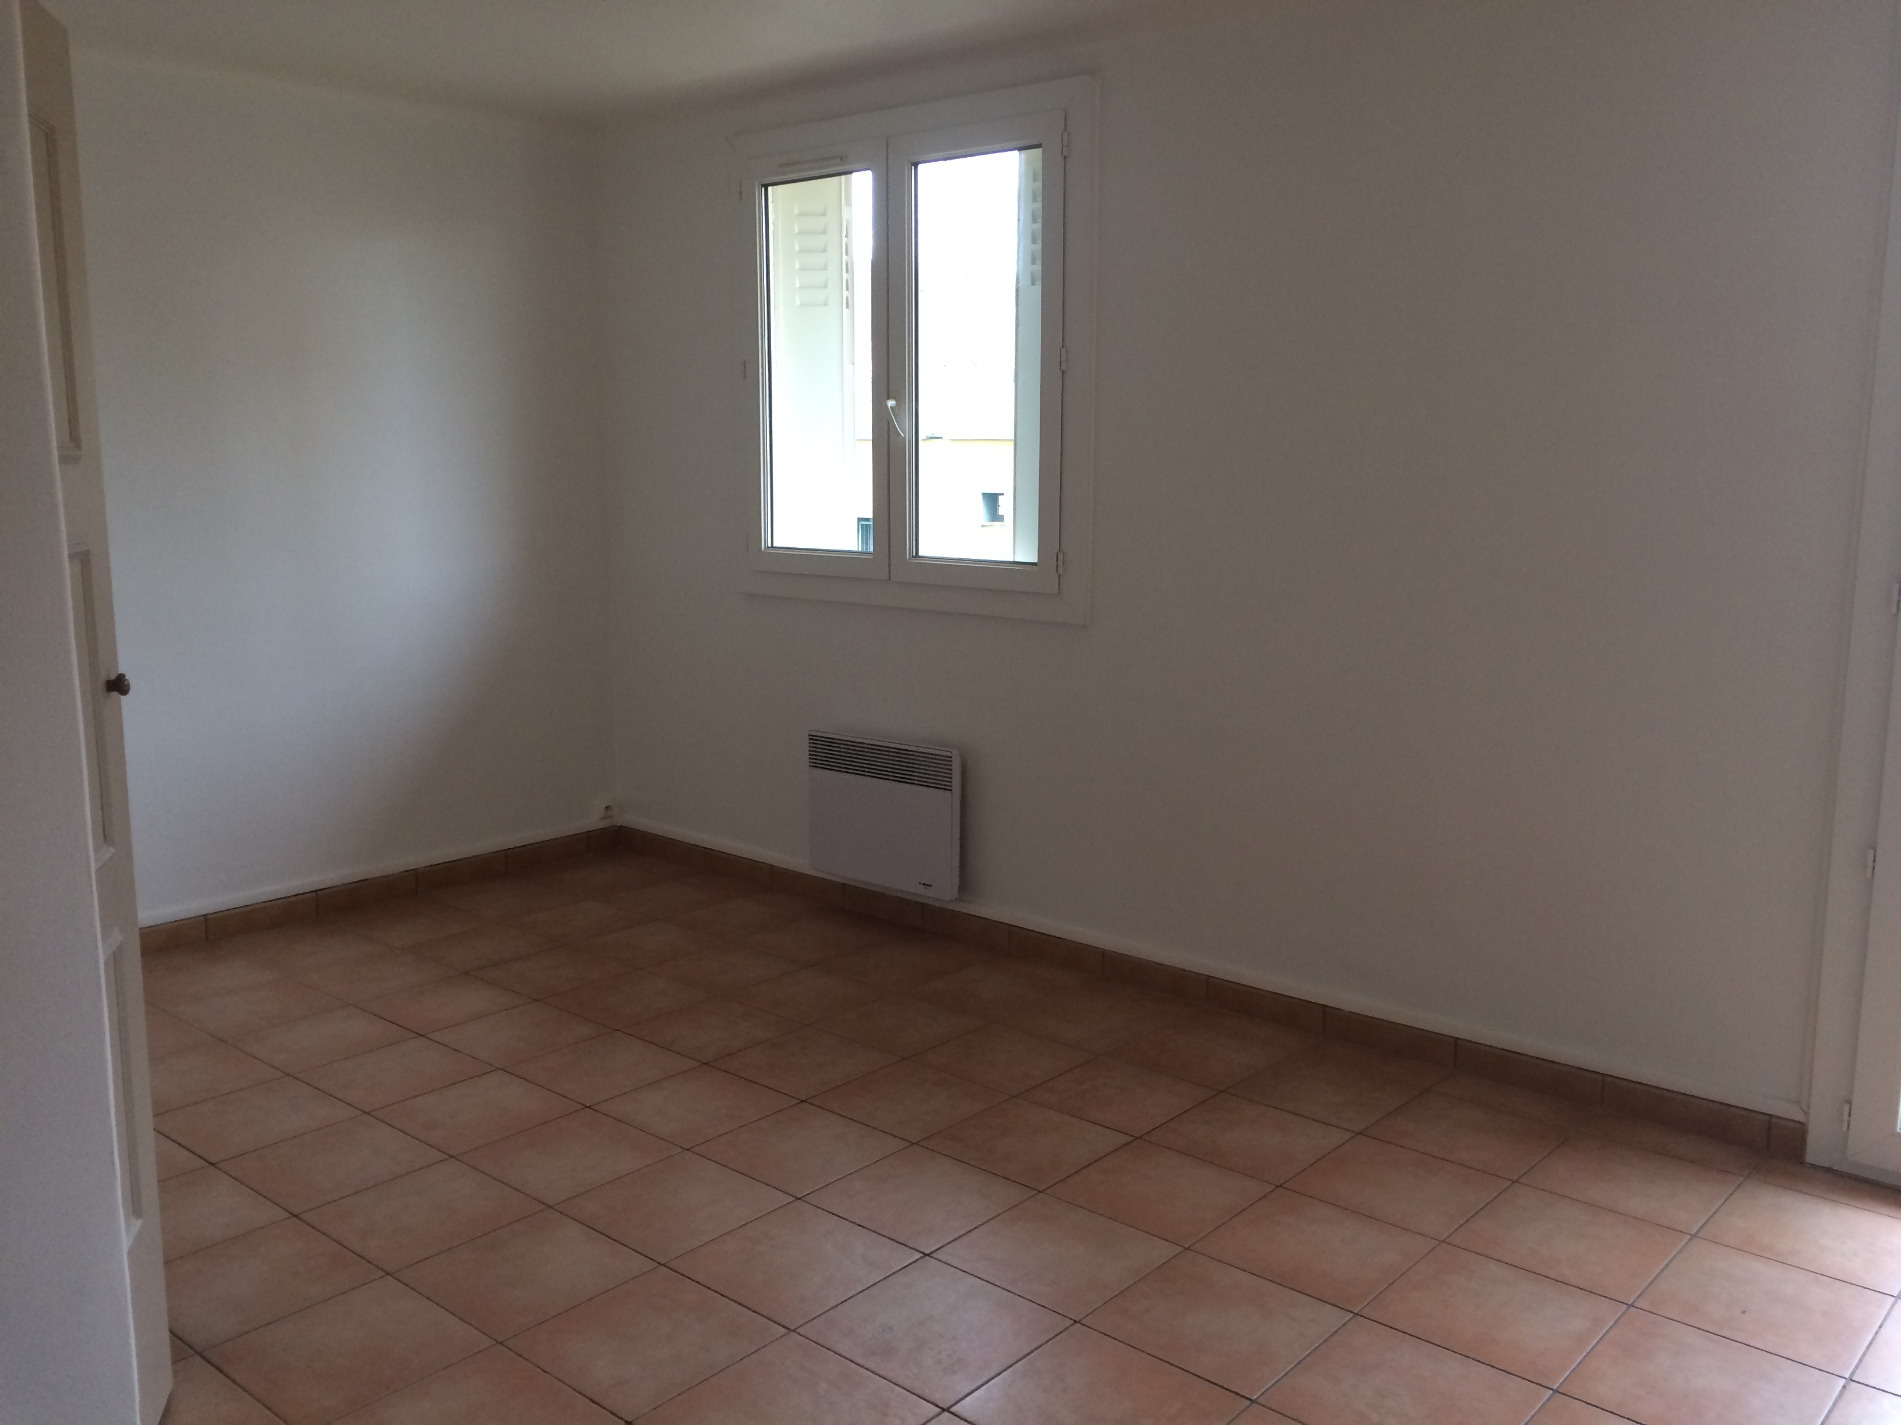 Location location appartement t3 4 aubagne - Location appartement aubagne ...